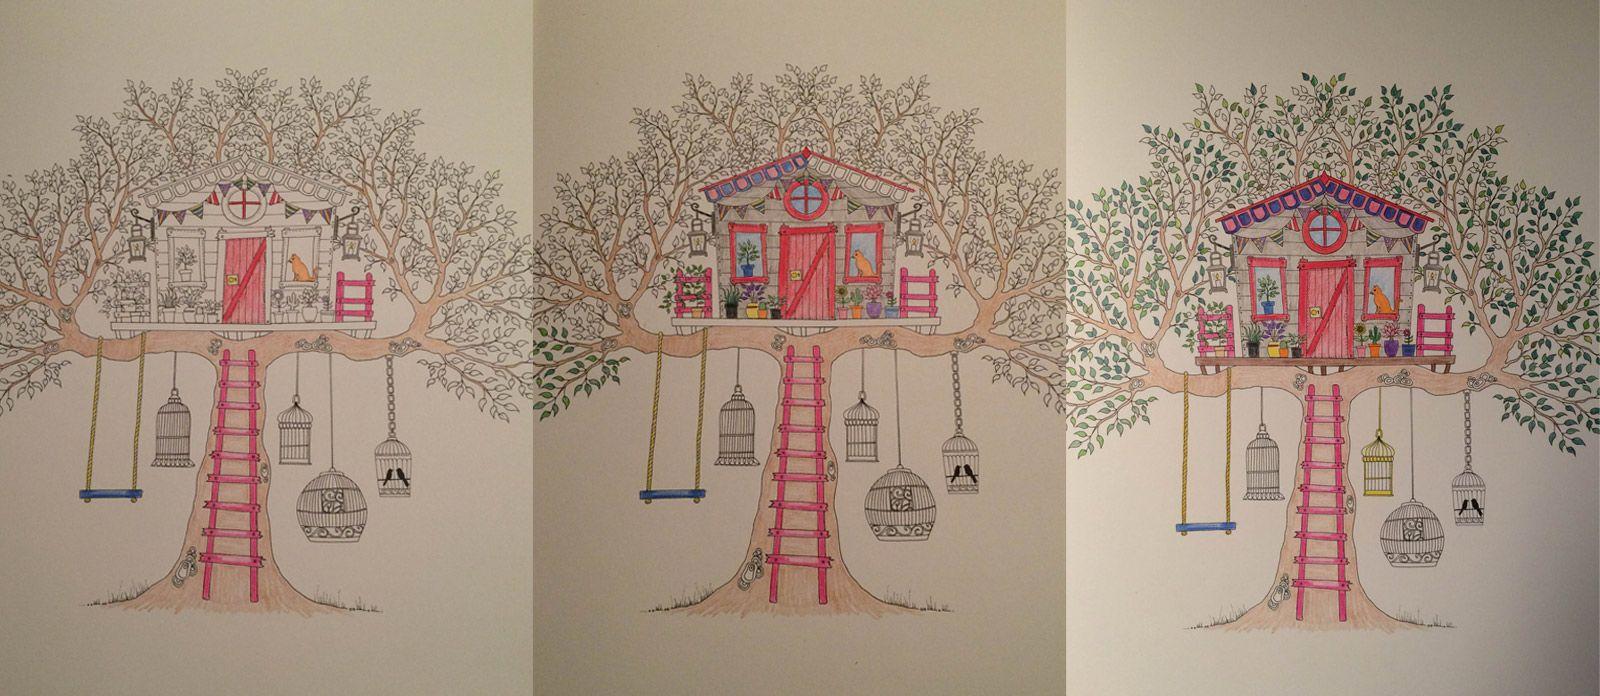 Johanna Basfords Beautiful Colouring Book Secret Garden Artists Edition Is A Delight